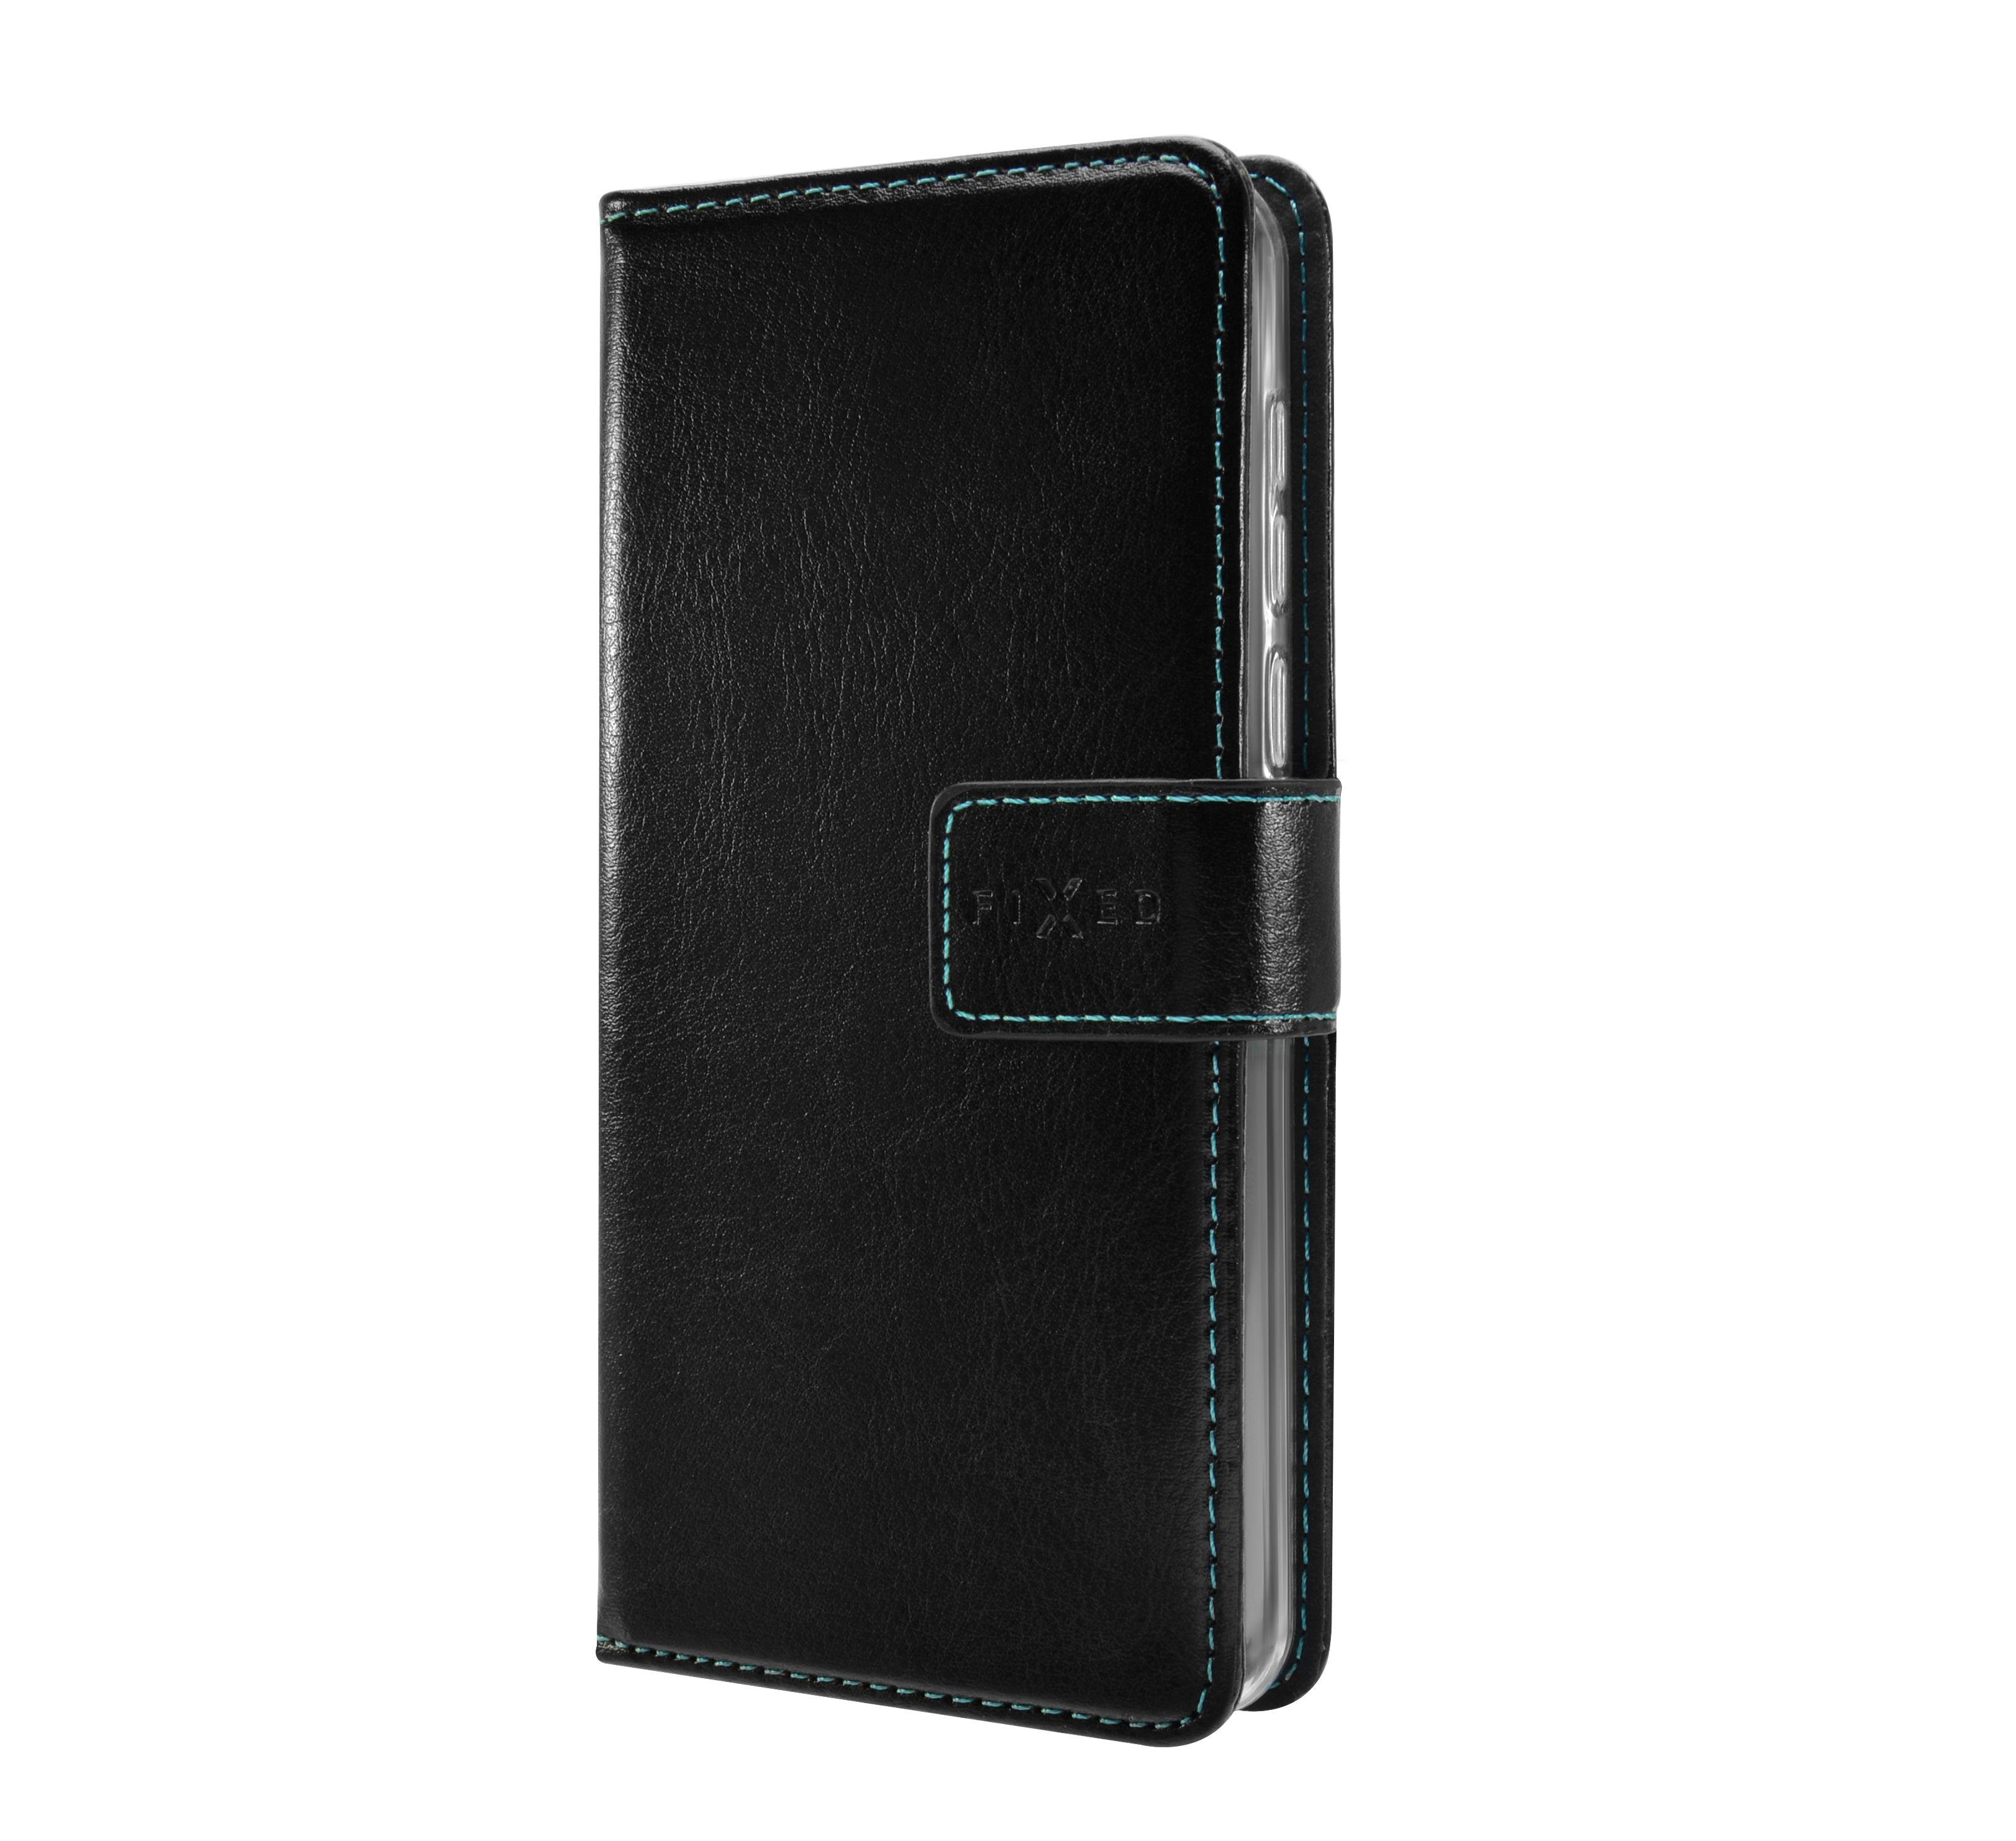 Pouzdro typu kniha FIXED Opus pro Asus ZenFone 6 (ZS630KL), černé